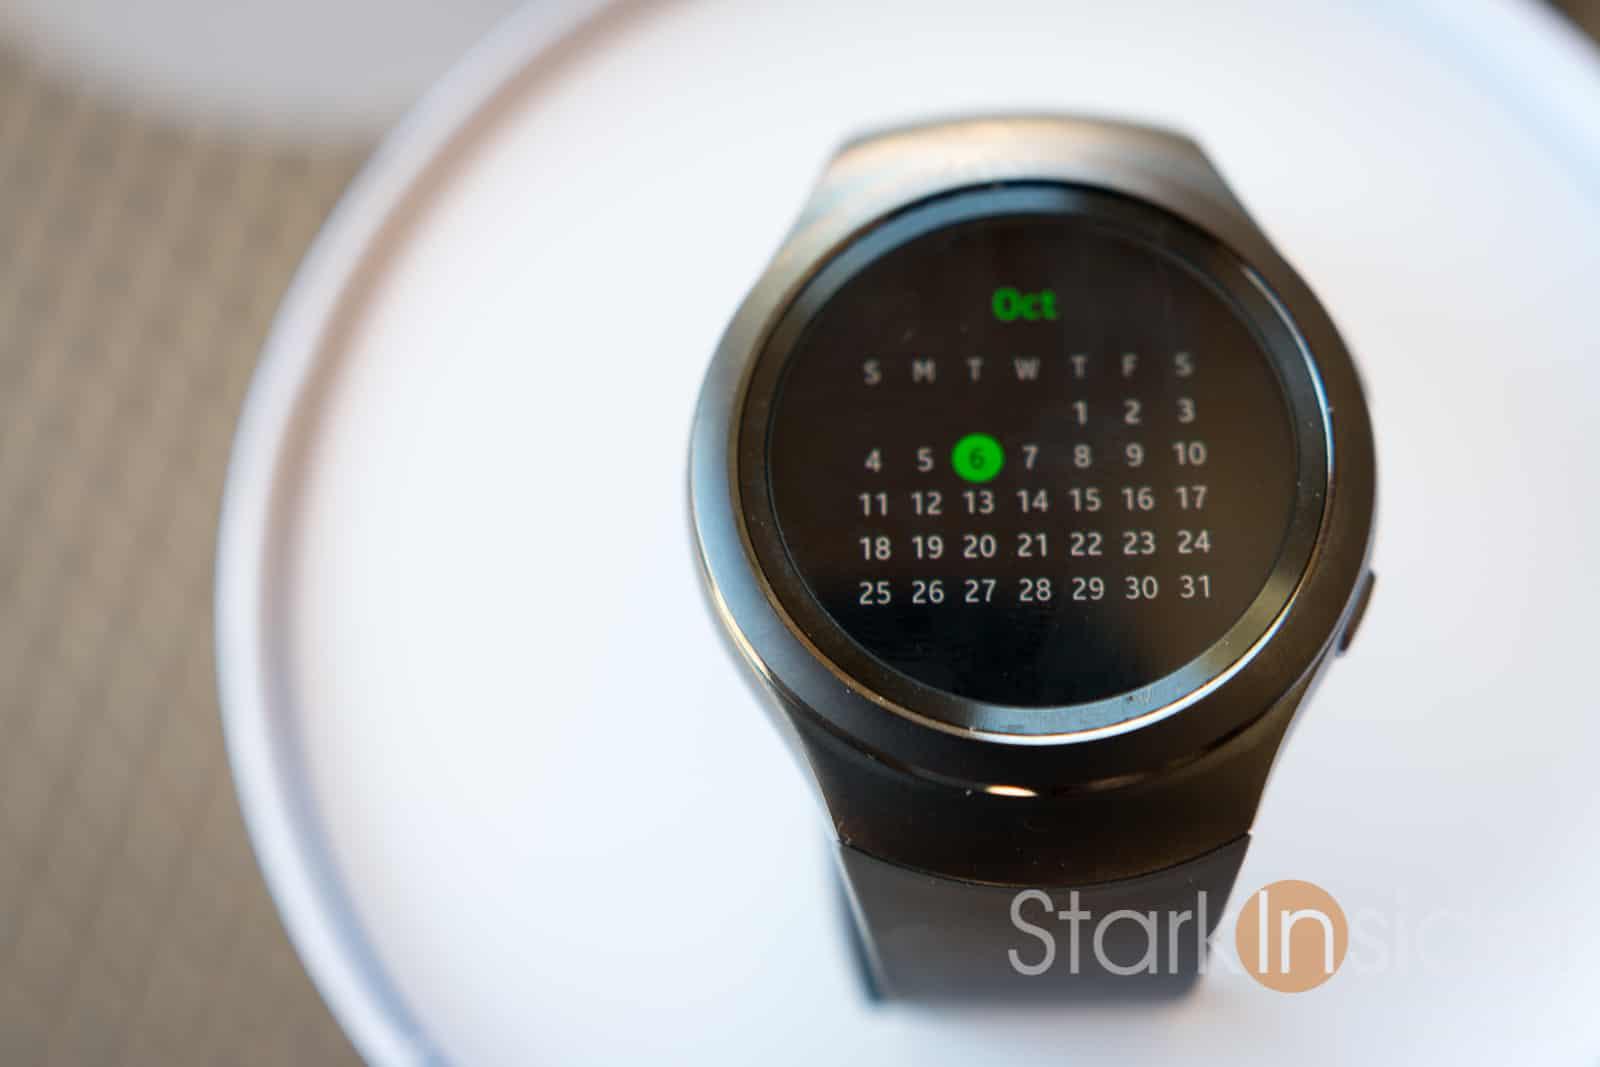 Verdict: Samsung Gear S2 smartwatch